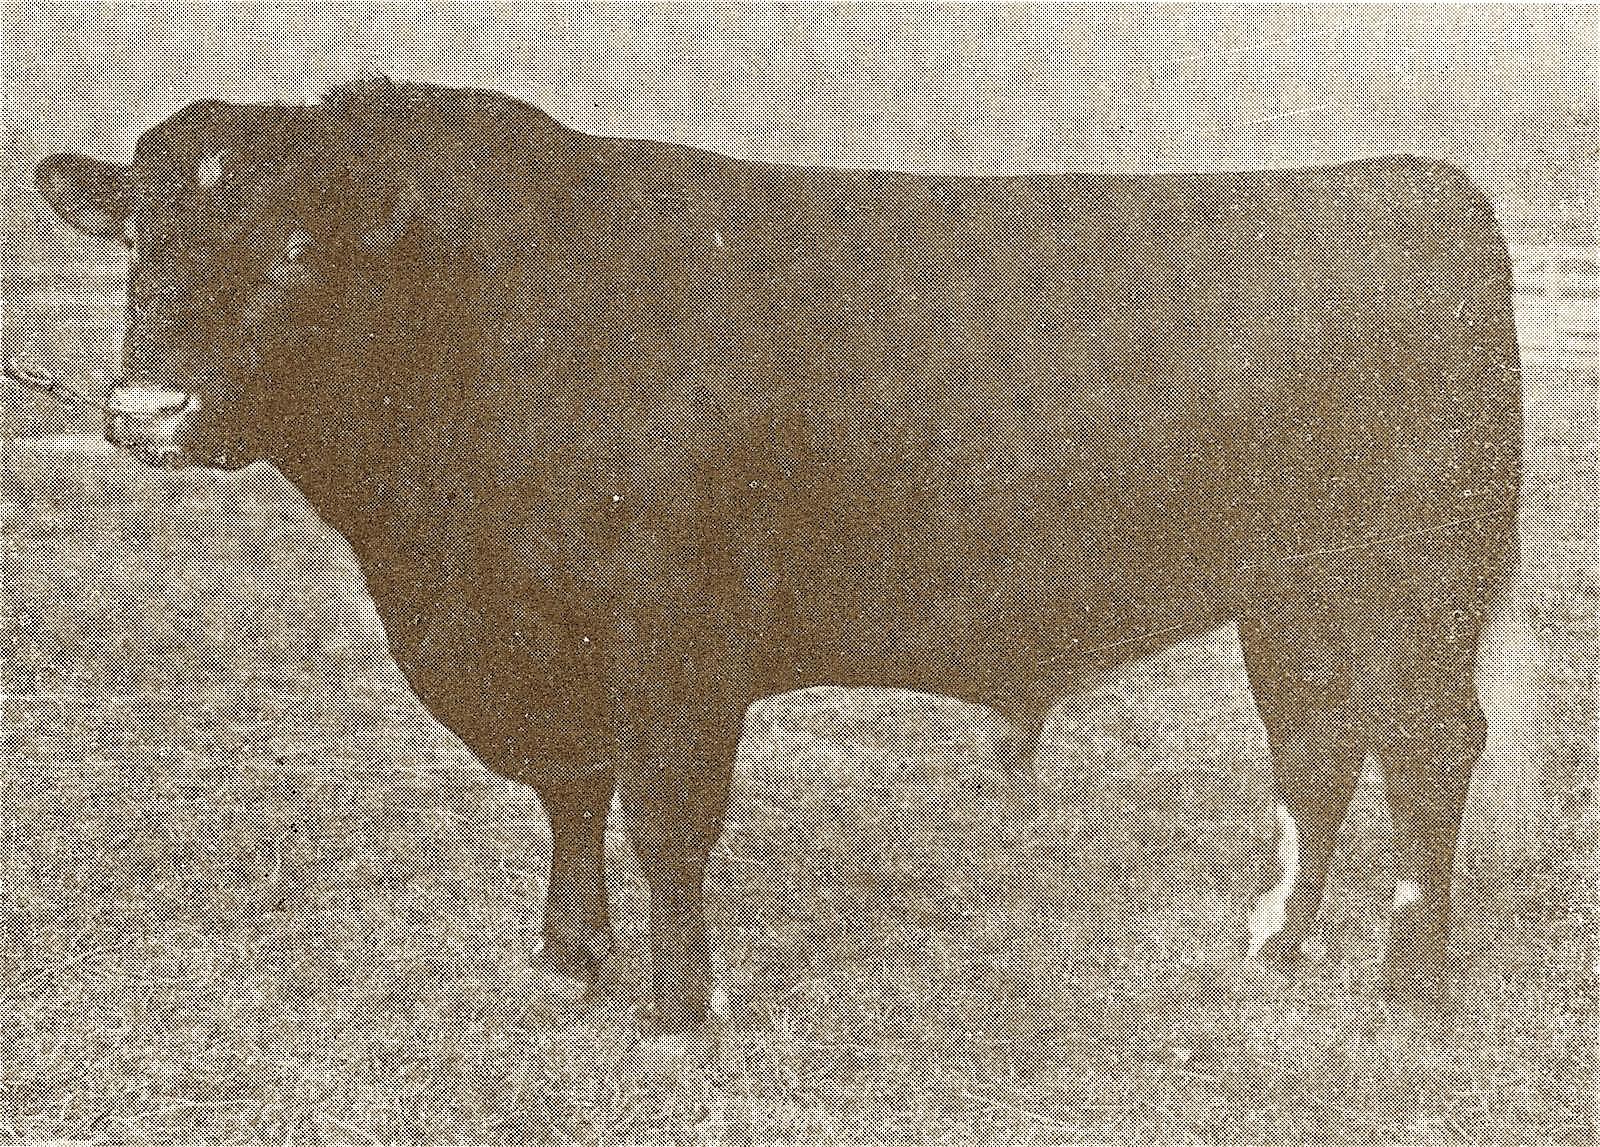 1901 Tippecanoe 44th x (Int'l. Jr. Champ).jpg